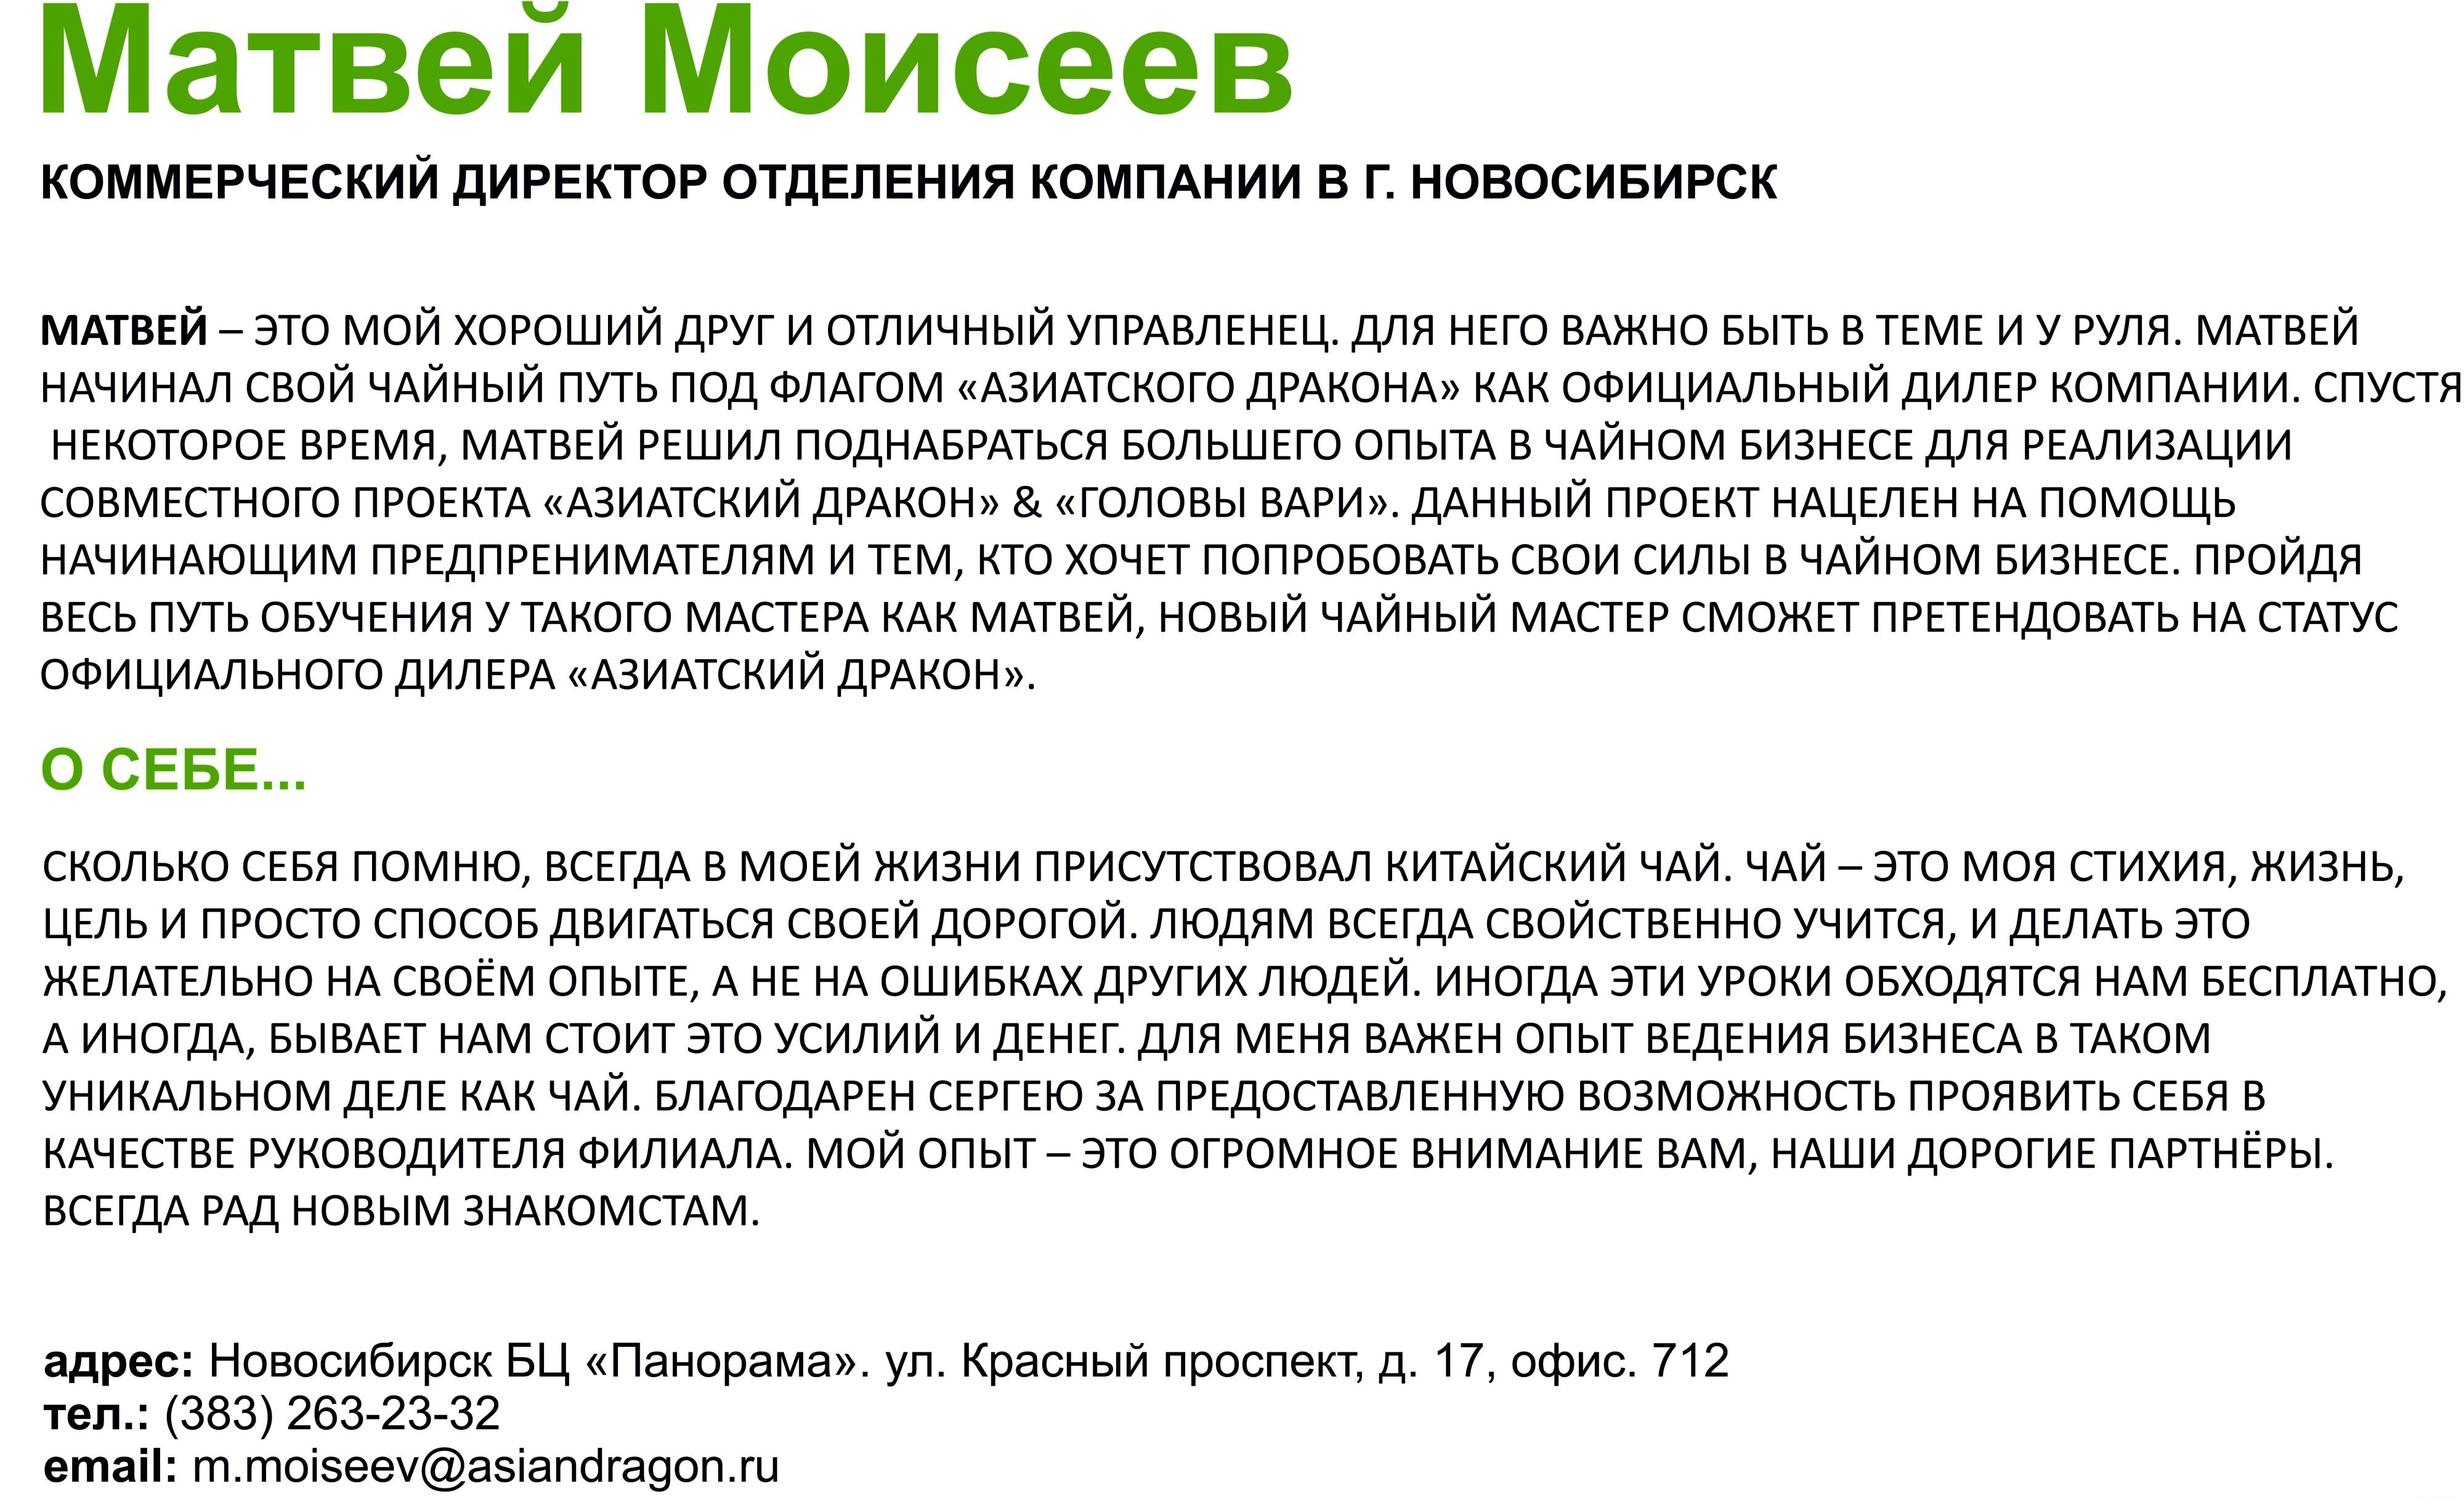 МОИСЕЕВ